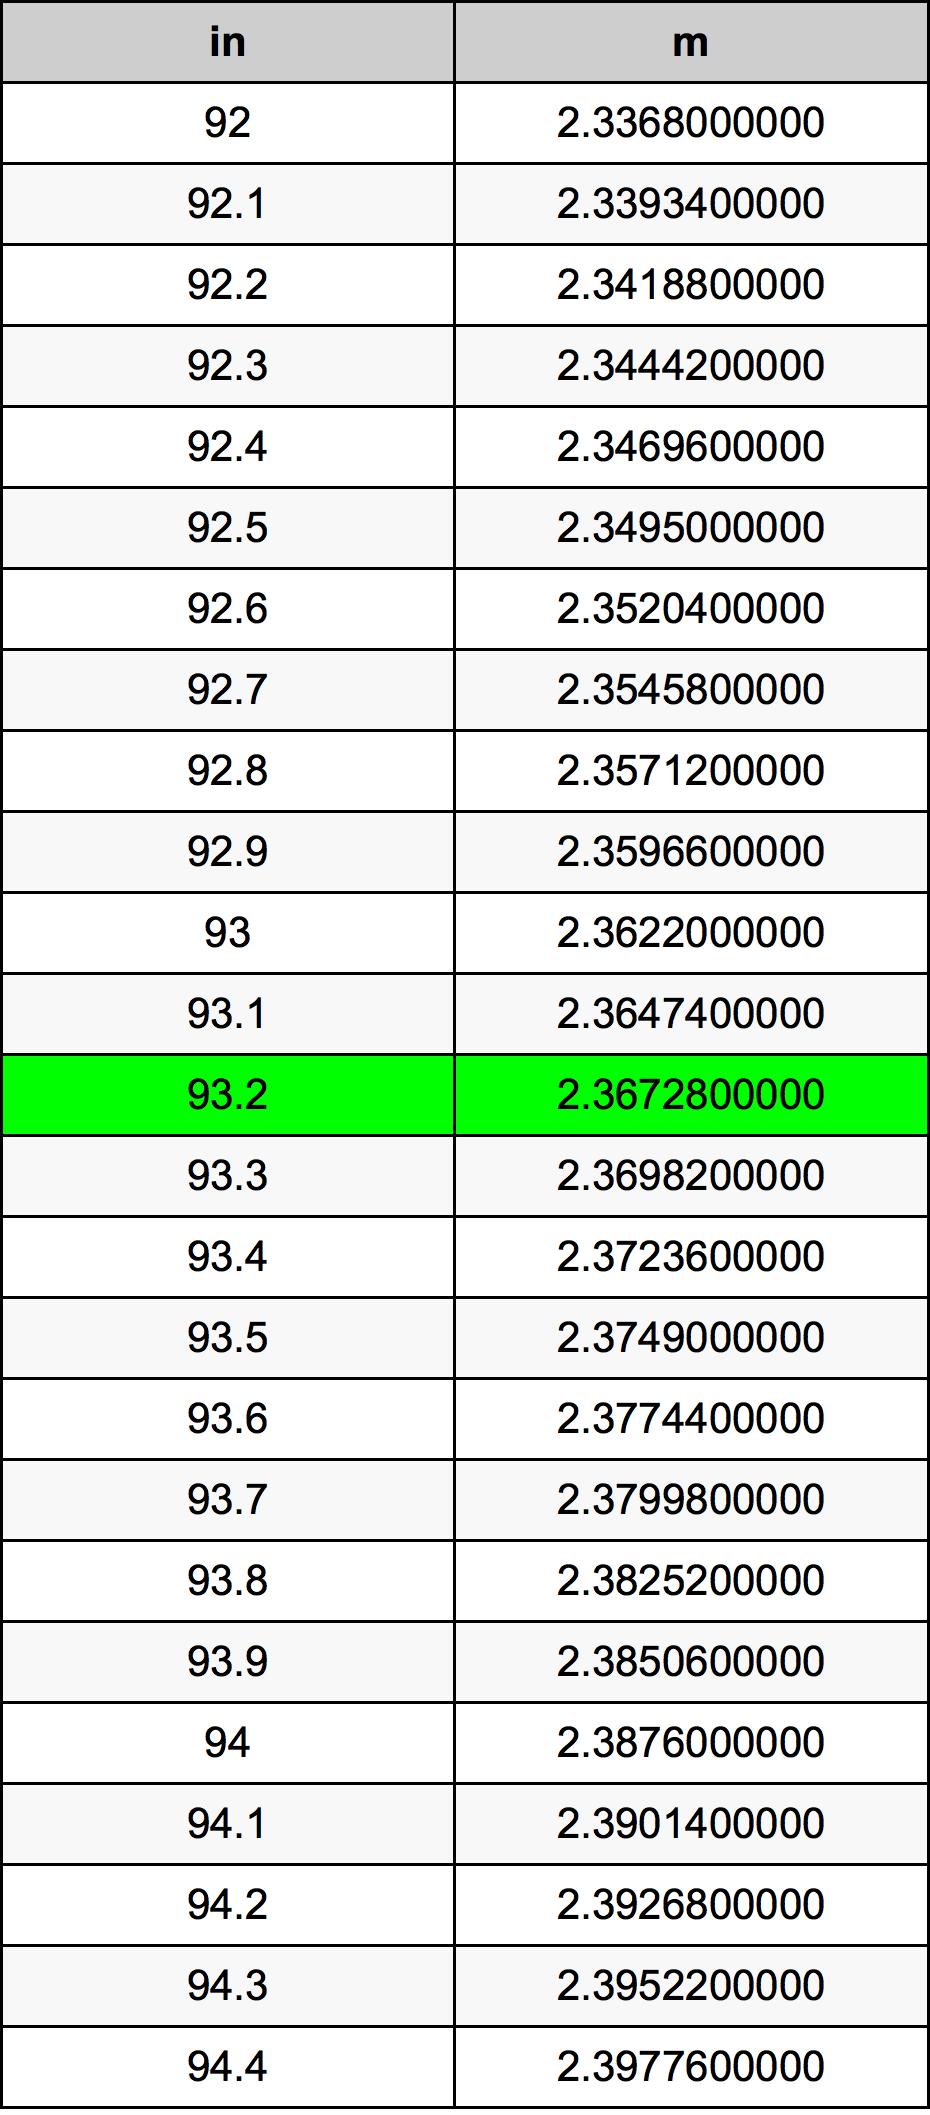 93.2 дюйм Таблица преобразования